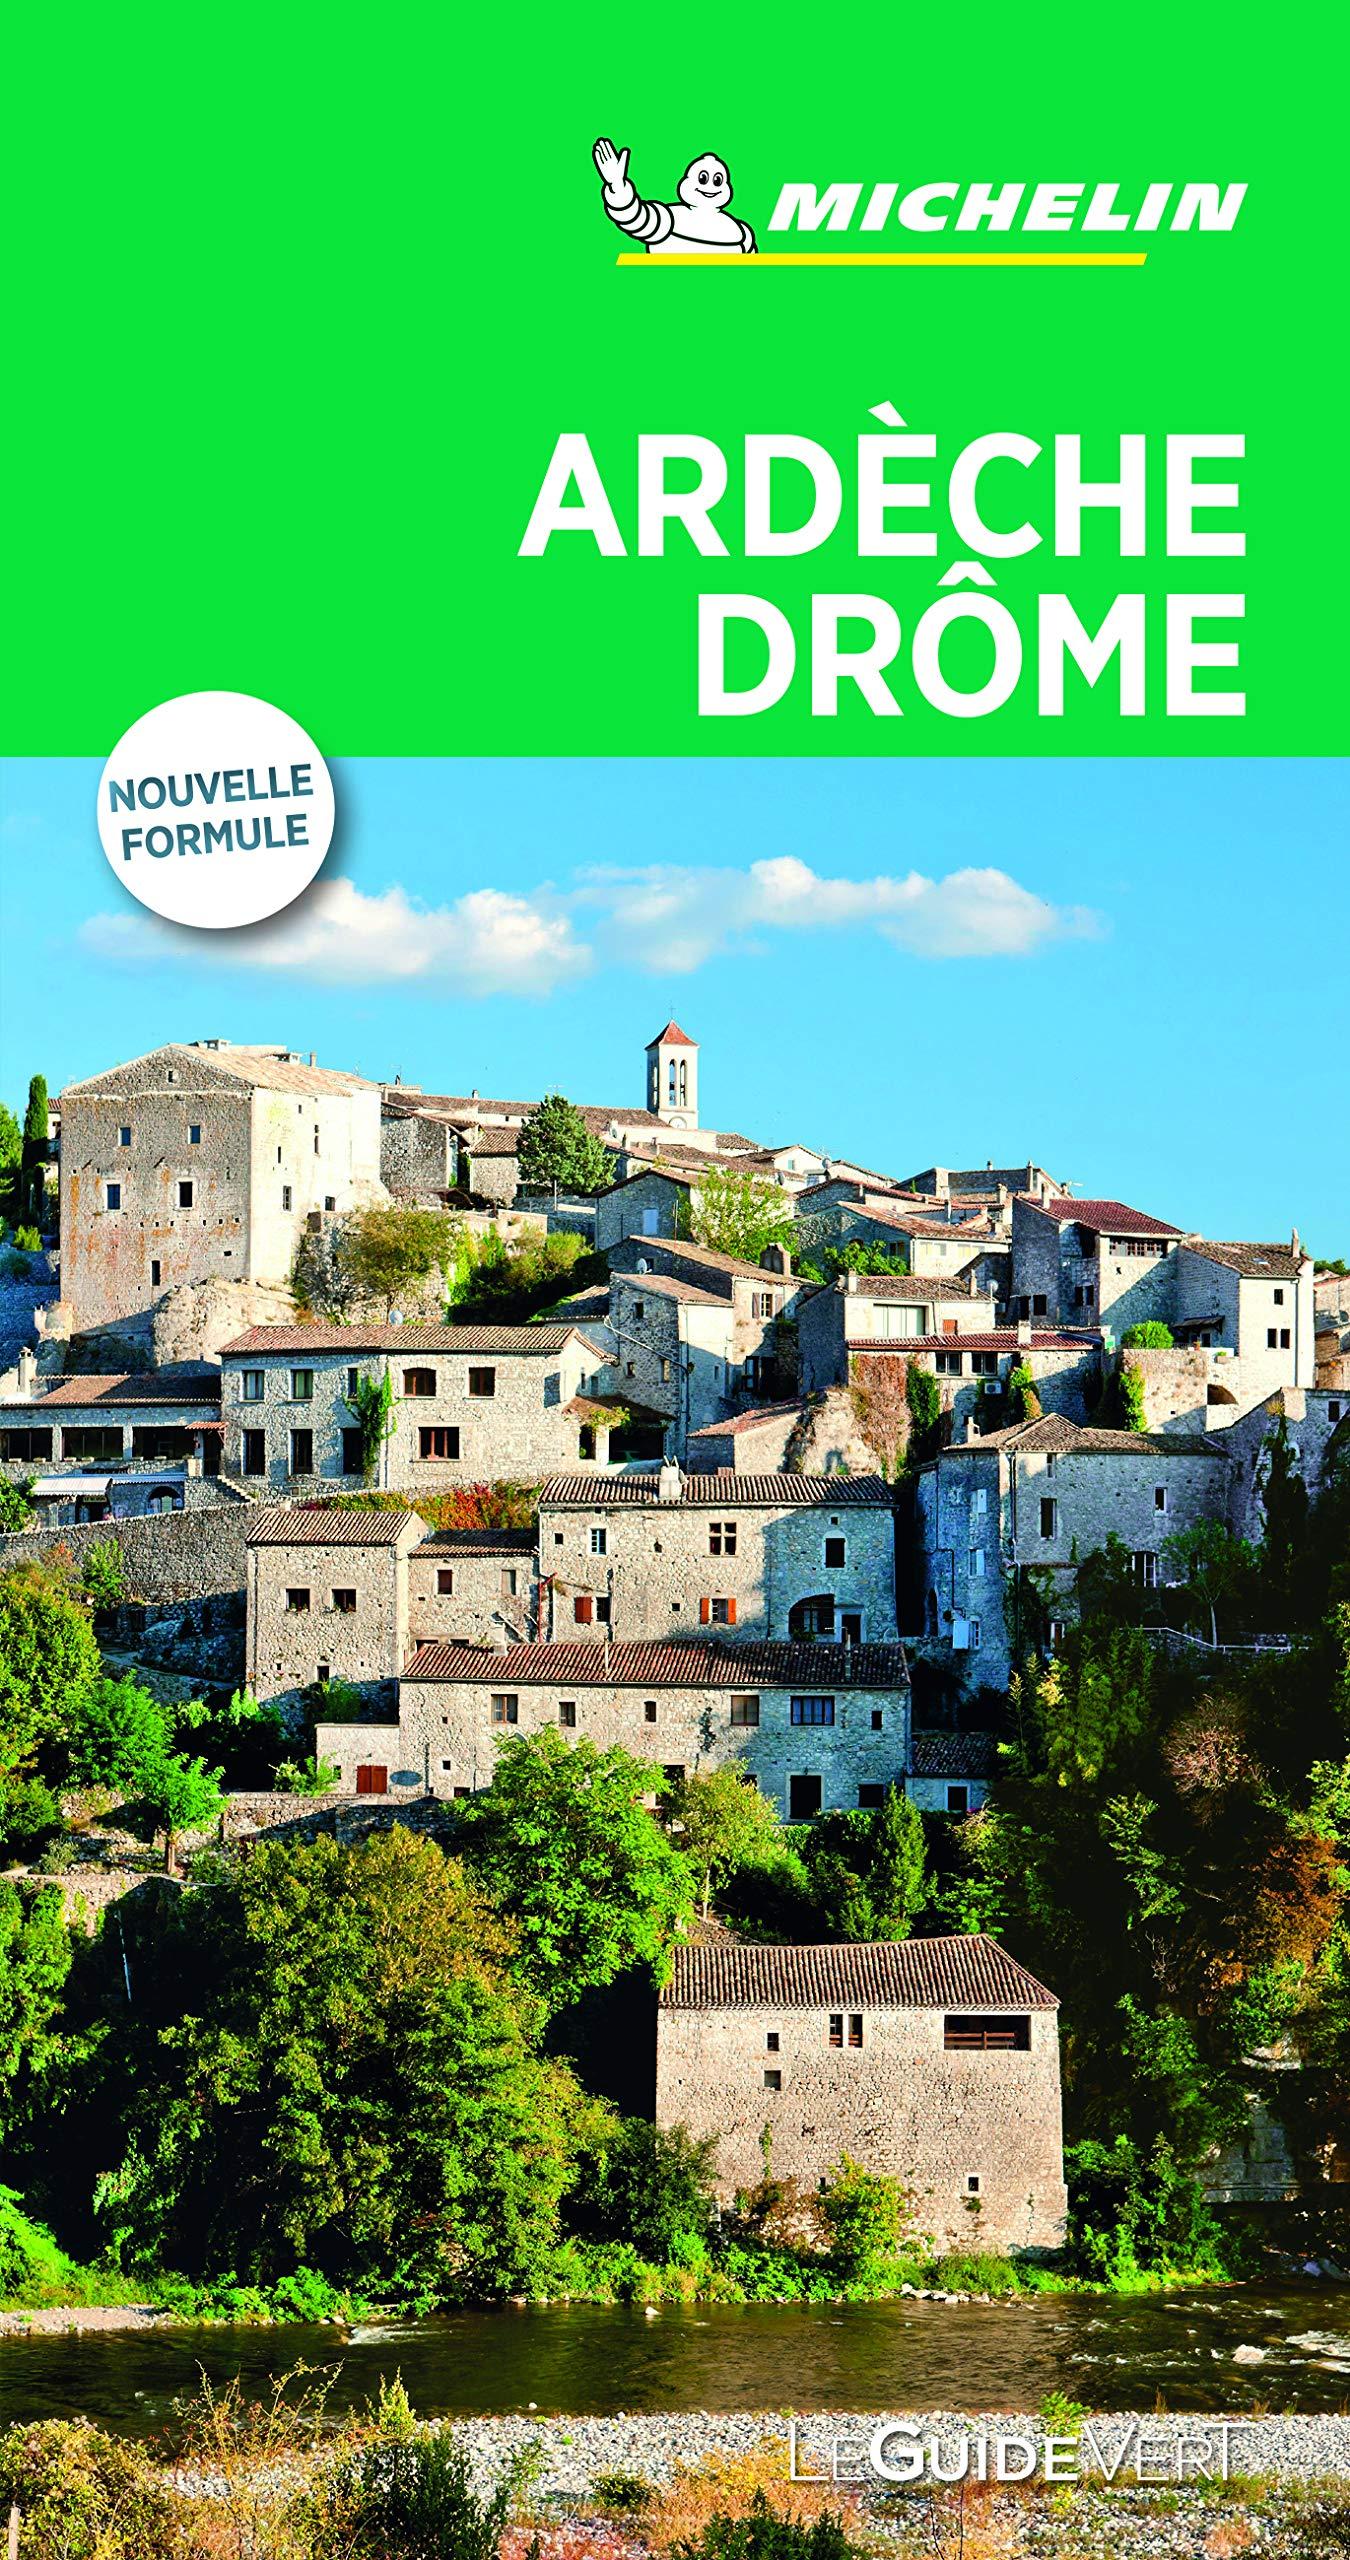 Ardèche Drôme (Le Guide Vert): Amazon.es: MICHELIN: Libros en idiomas extranjeros